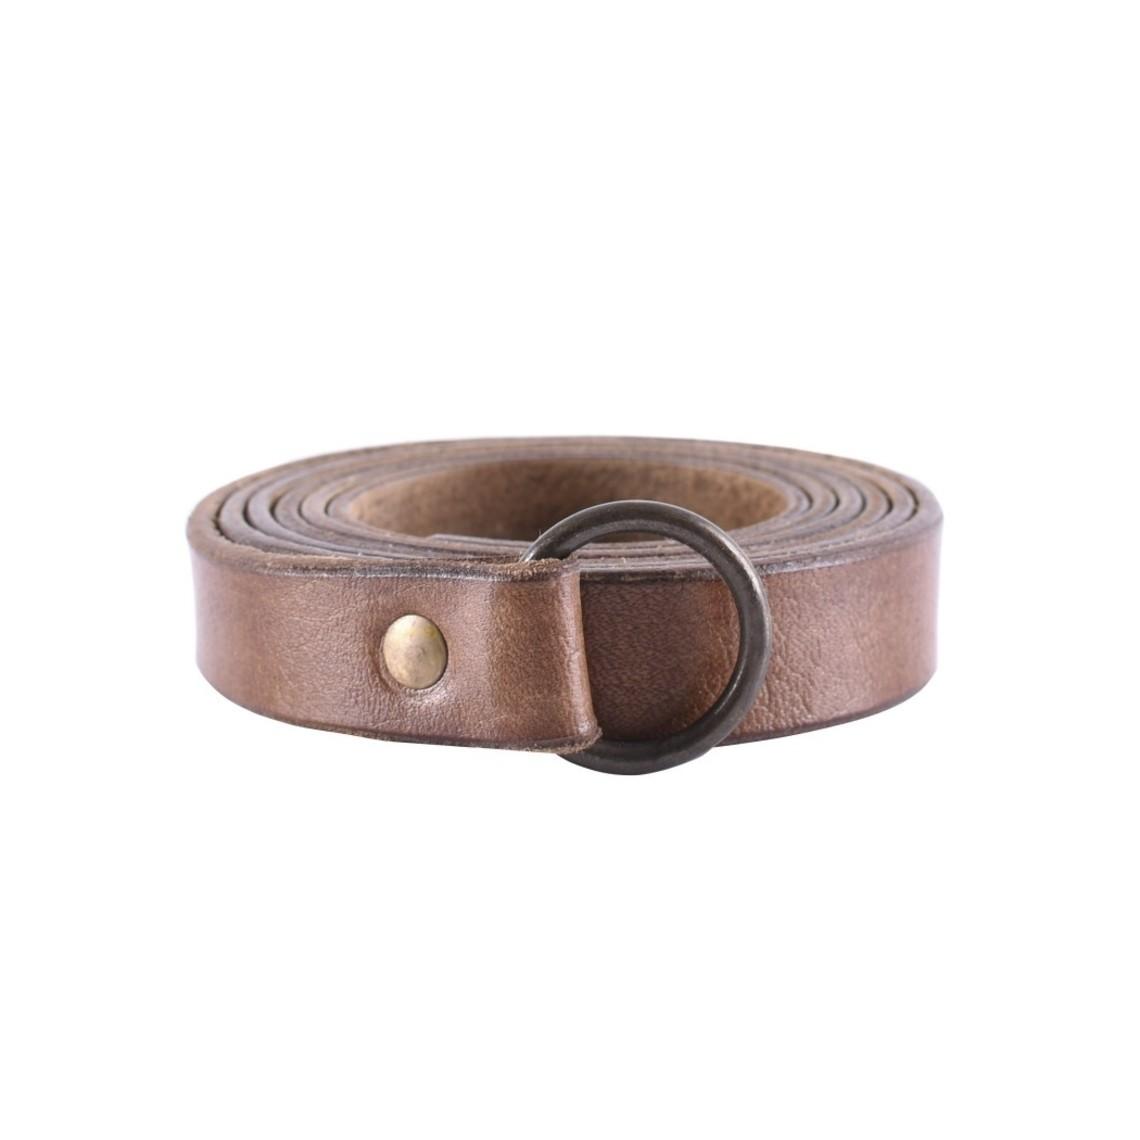 Deepeeka correa del anillo 190 cm, marrón